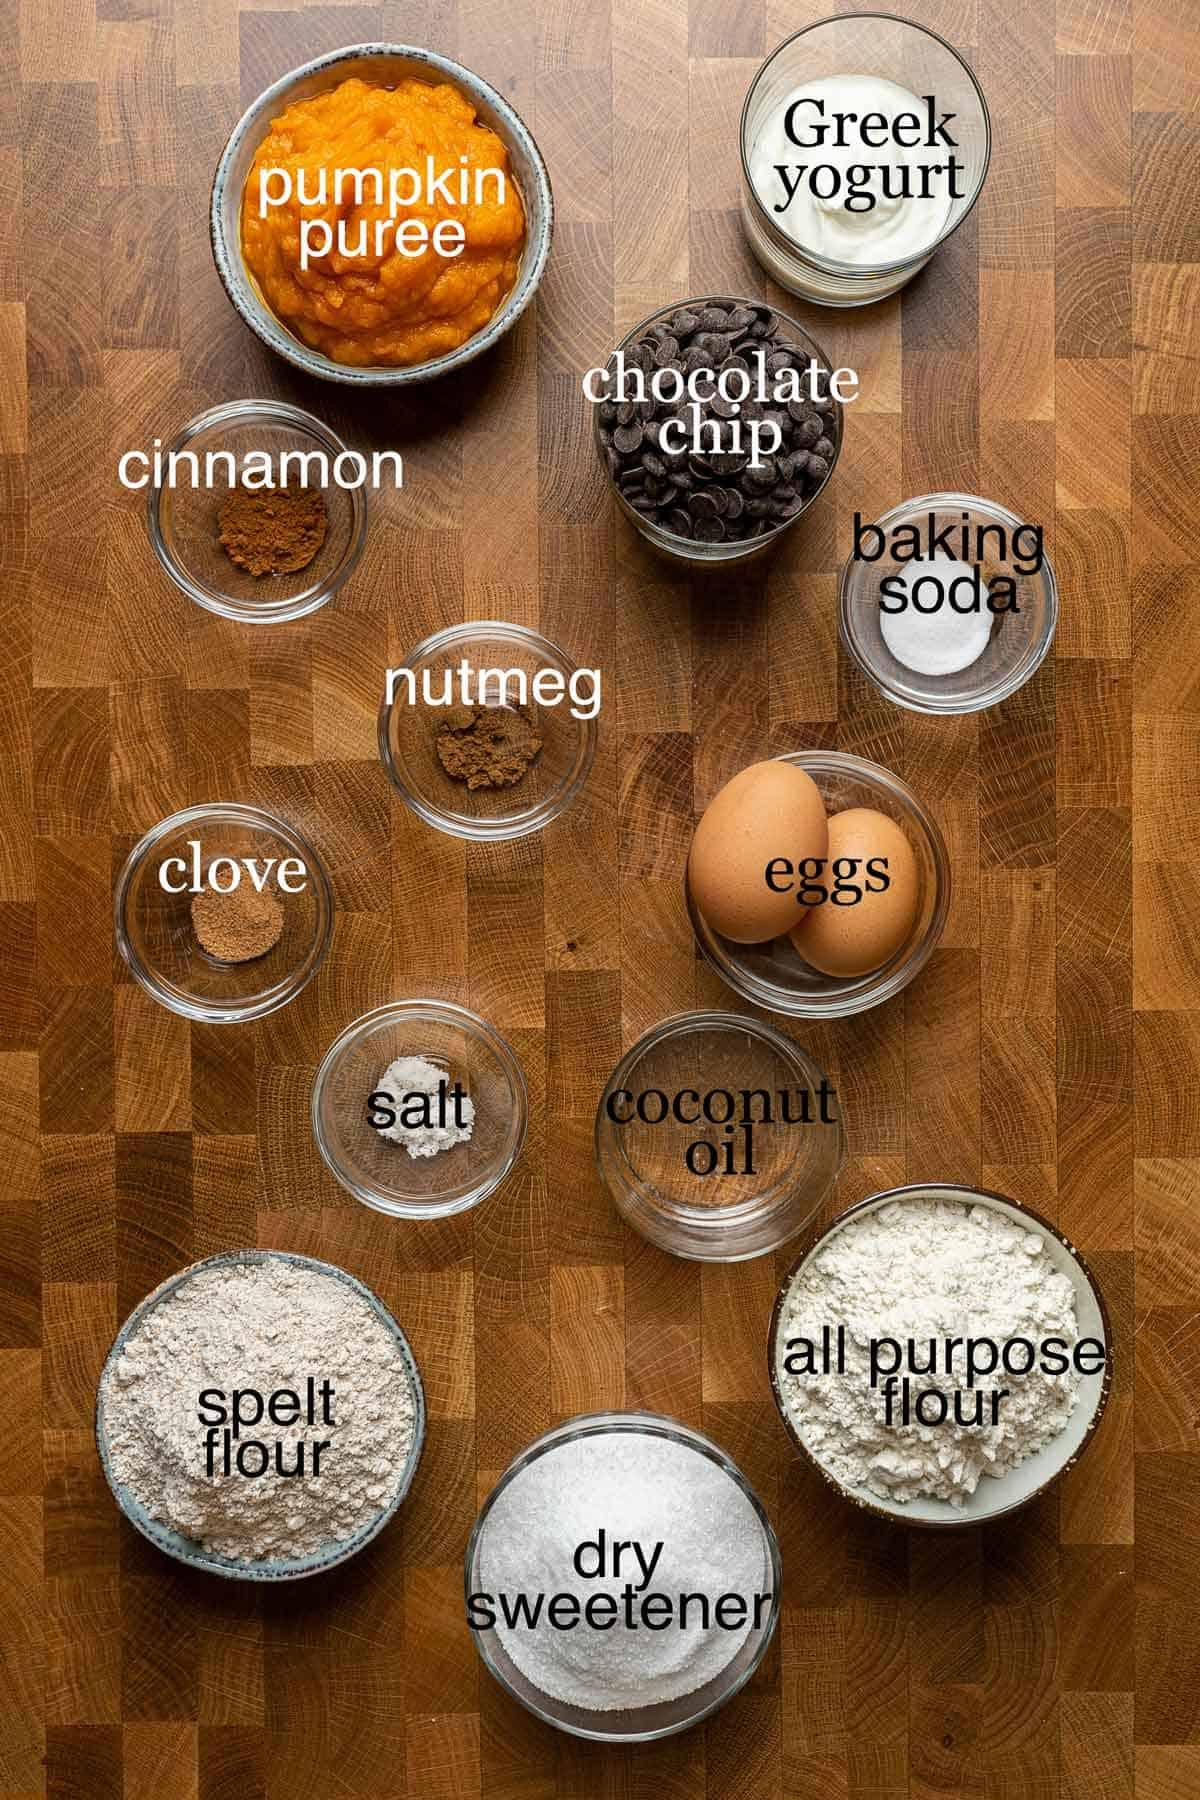 Ingredients to make healthy chocolate chip pumpkin bread